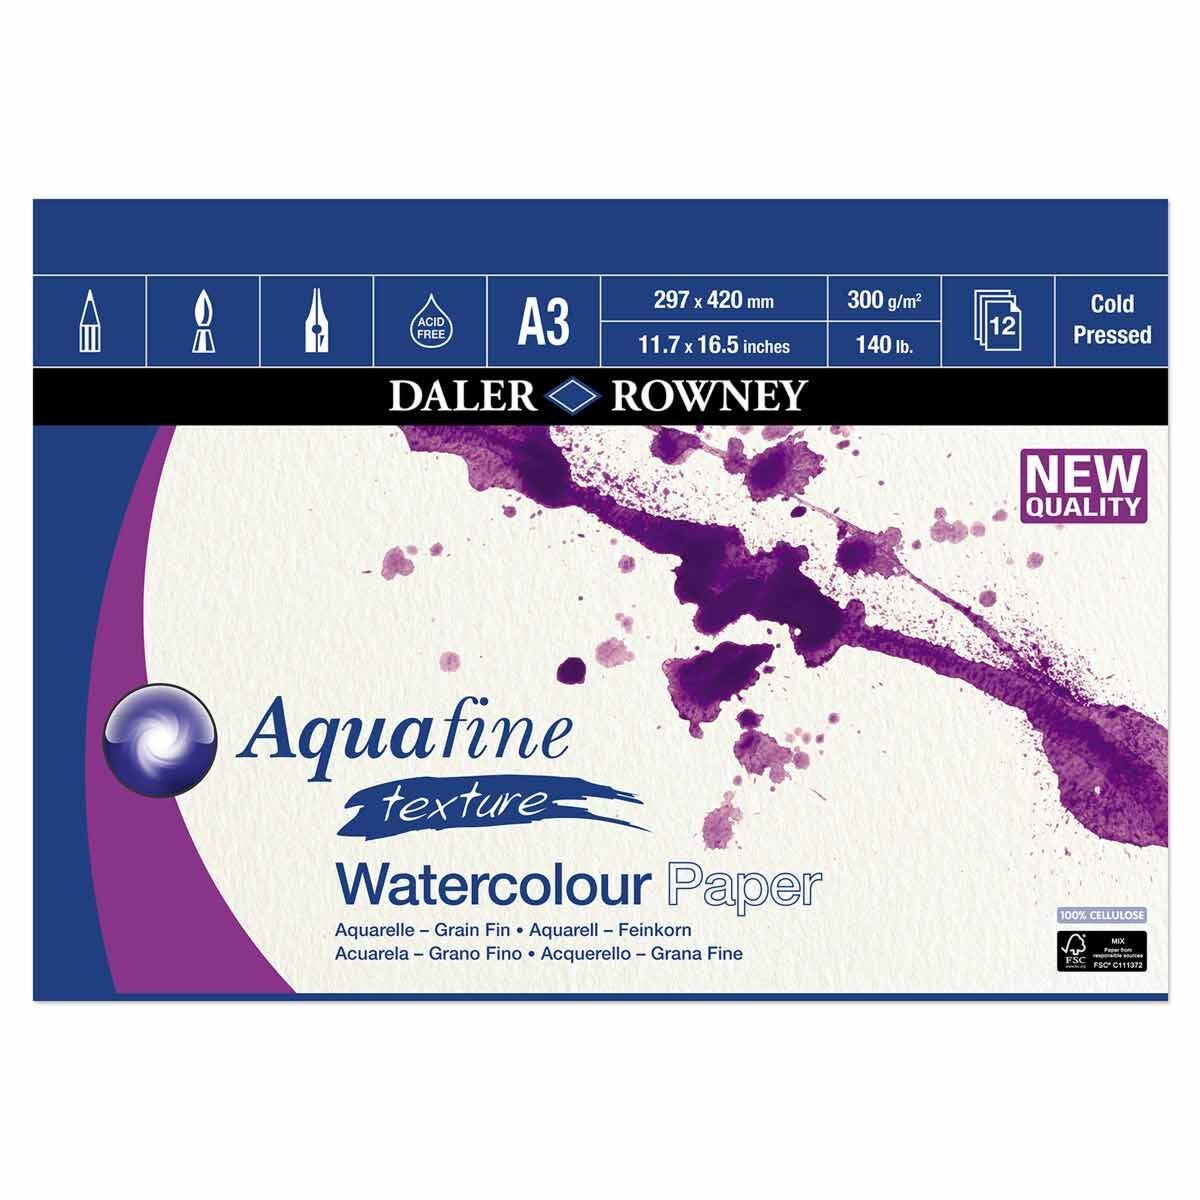 Daler Rowney Aquafine Watercolour Pad A3